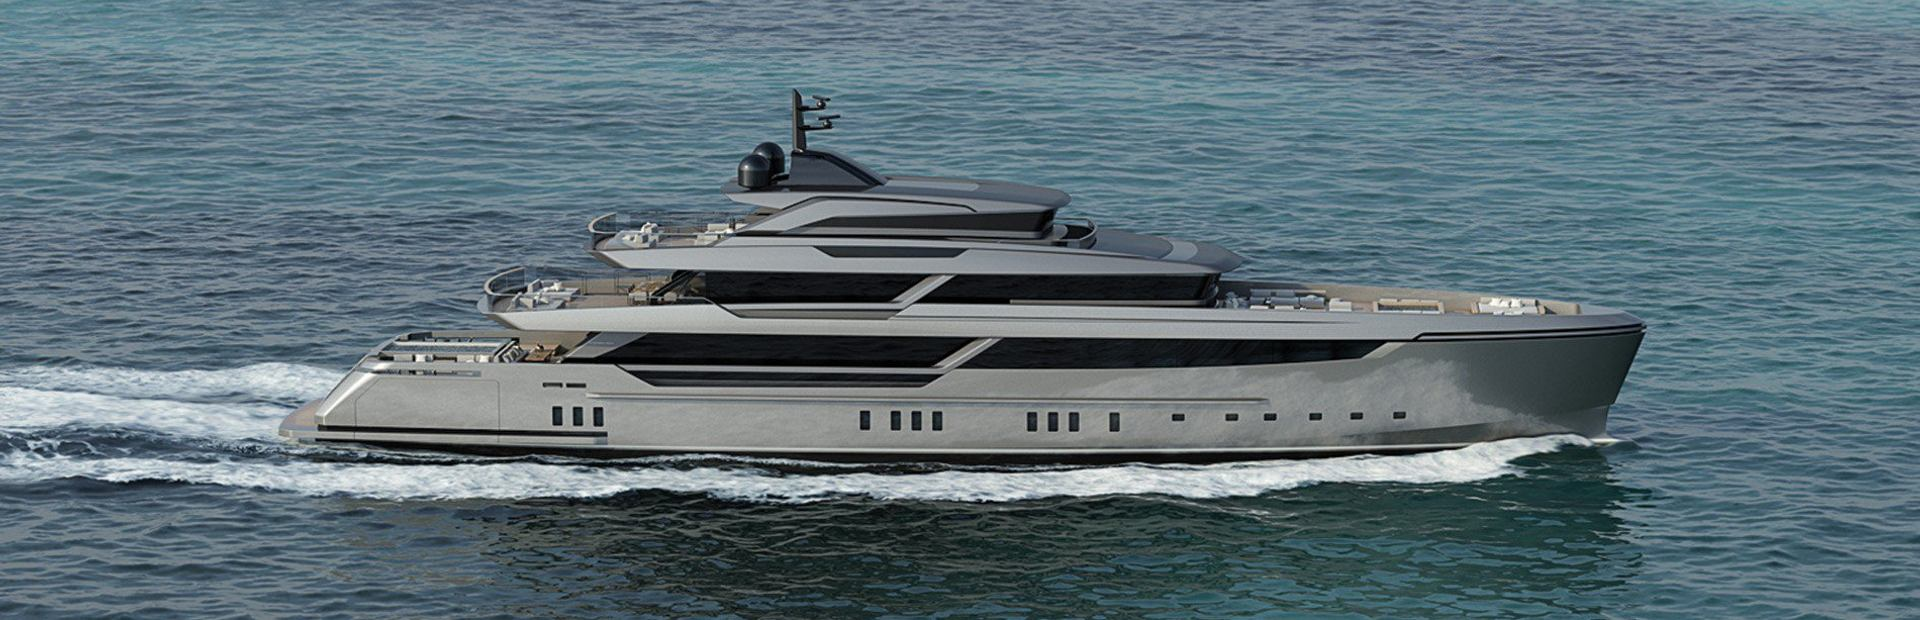 56Steel Yacht Charter